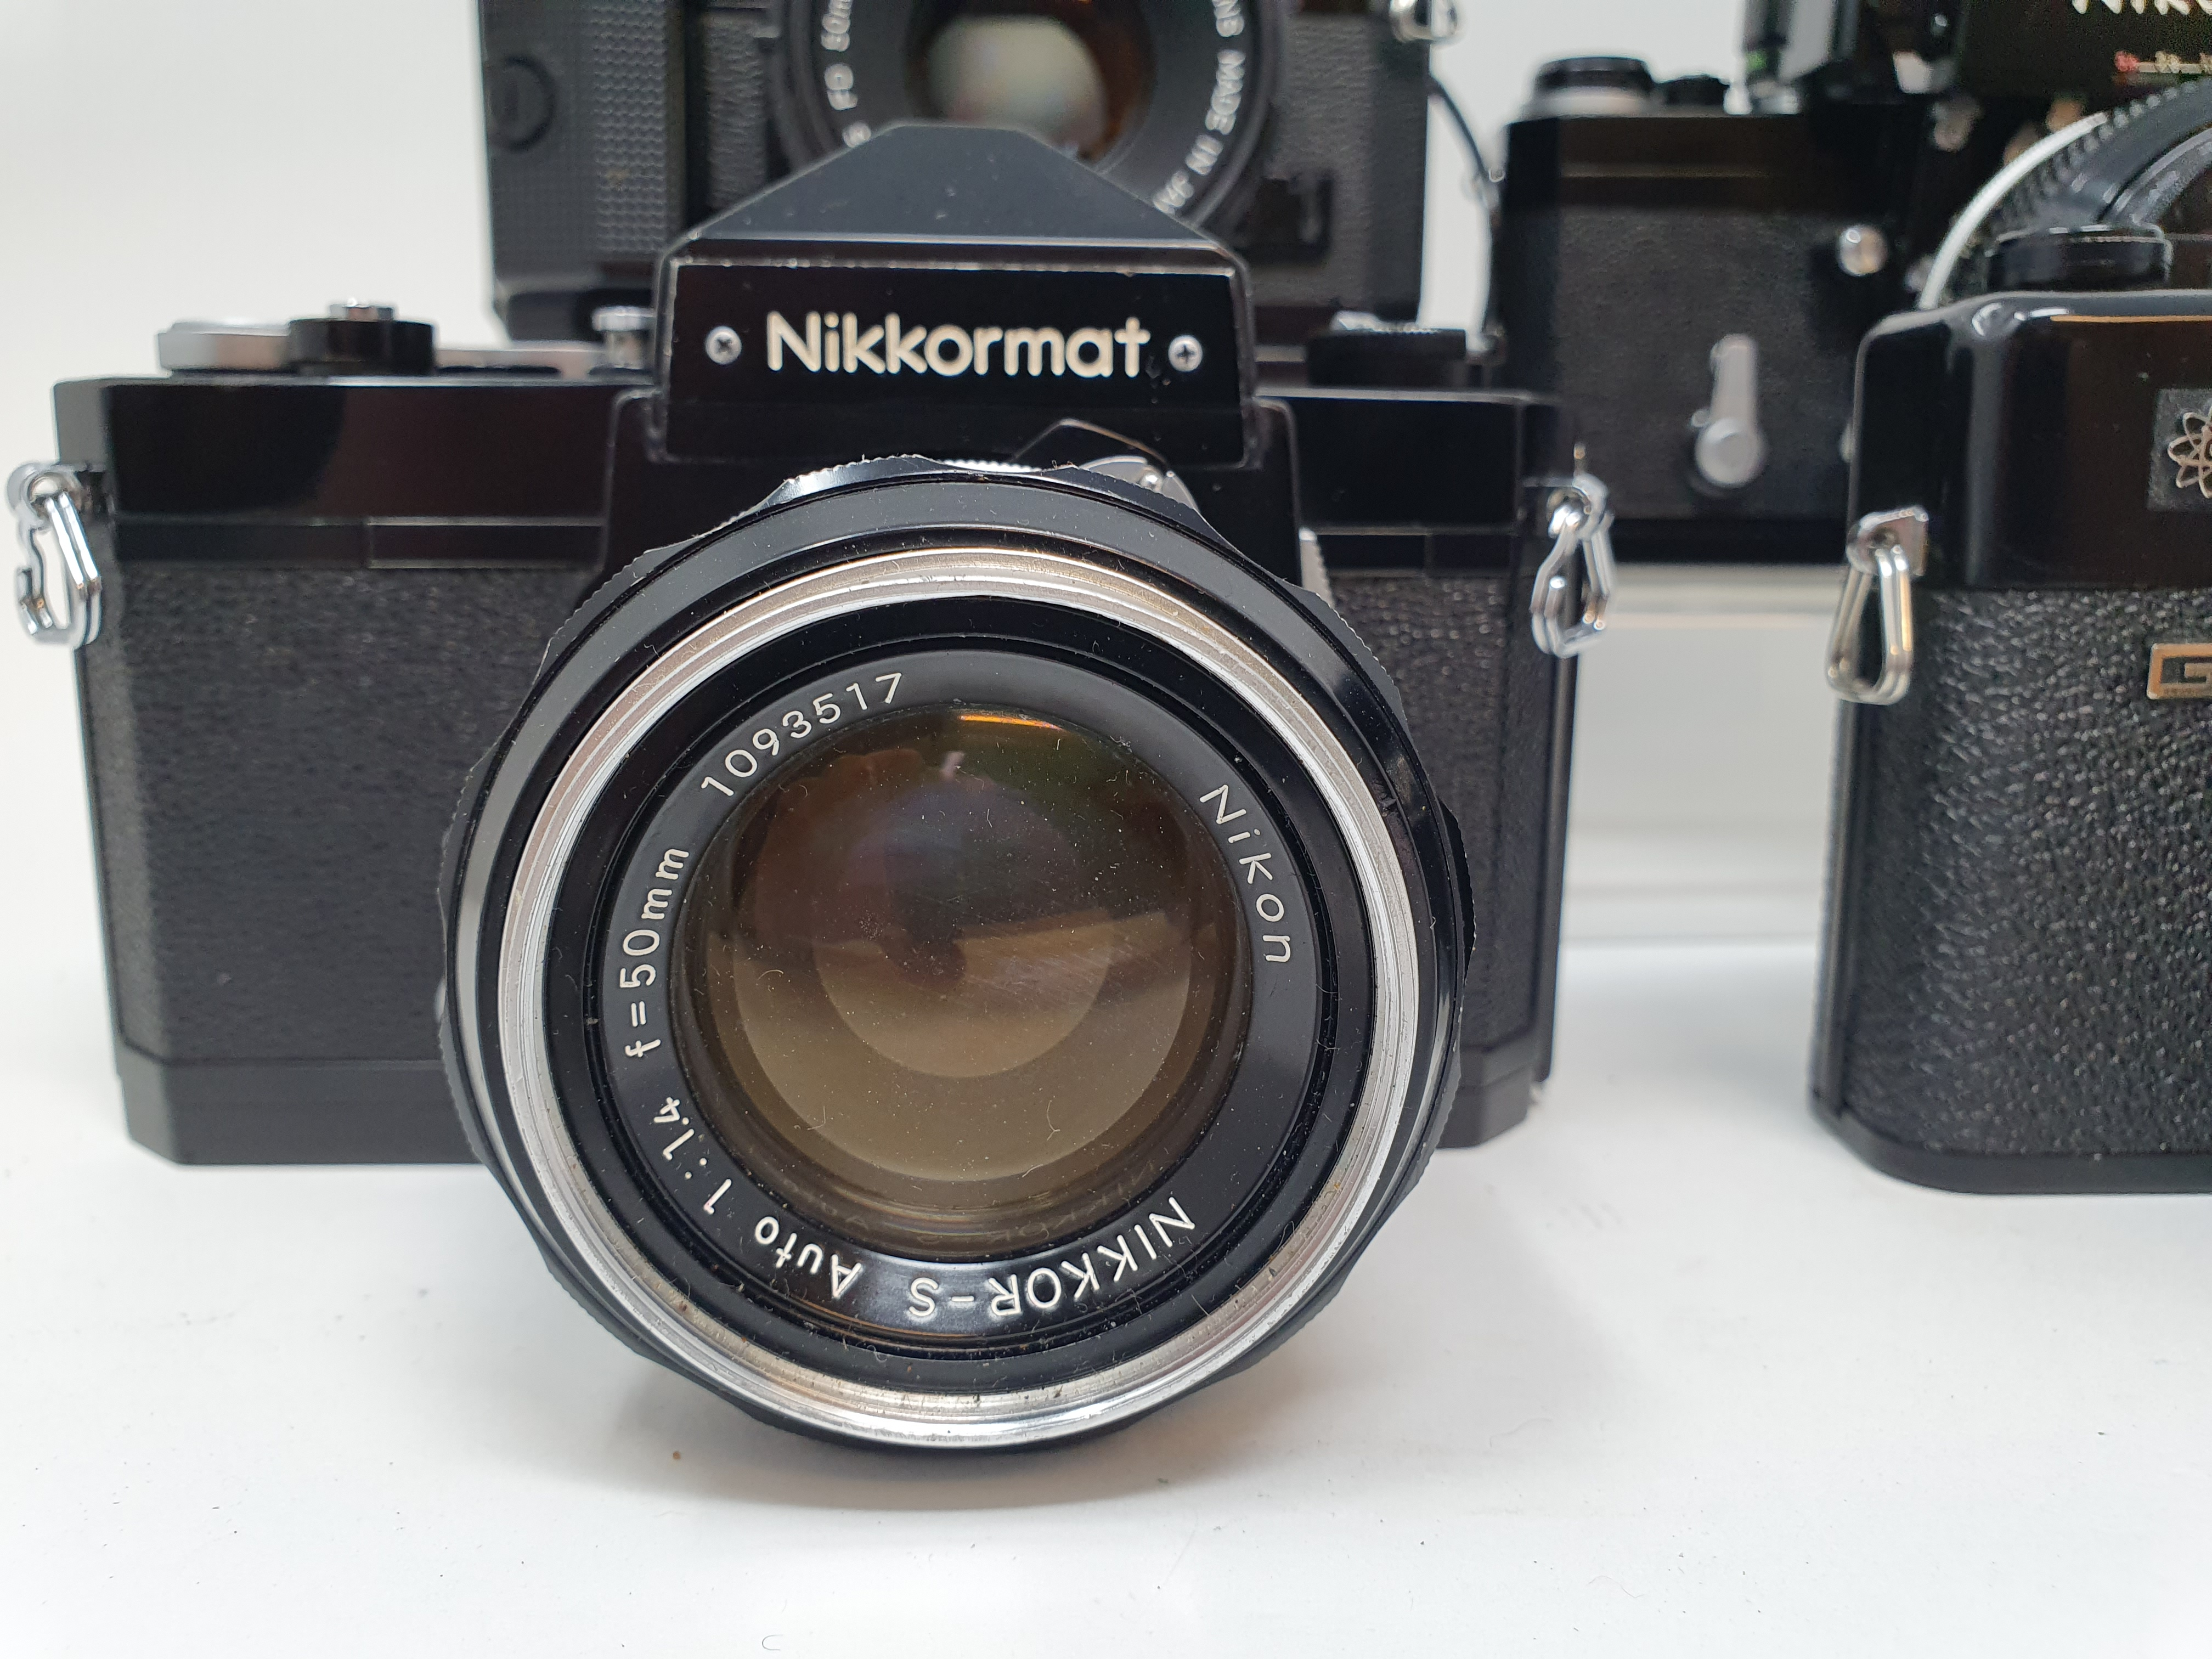 A Nikon F camera, with outer case, a Yashica GTN camera, a Canon A-1 camera, and a Nikkormat Nikon - Image 2 of 6